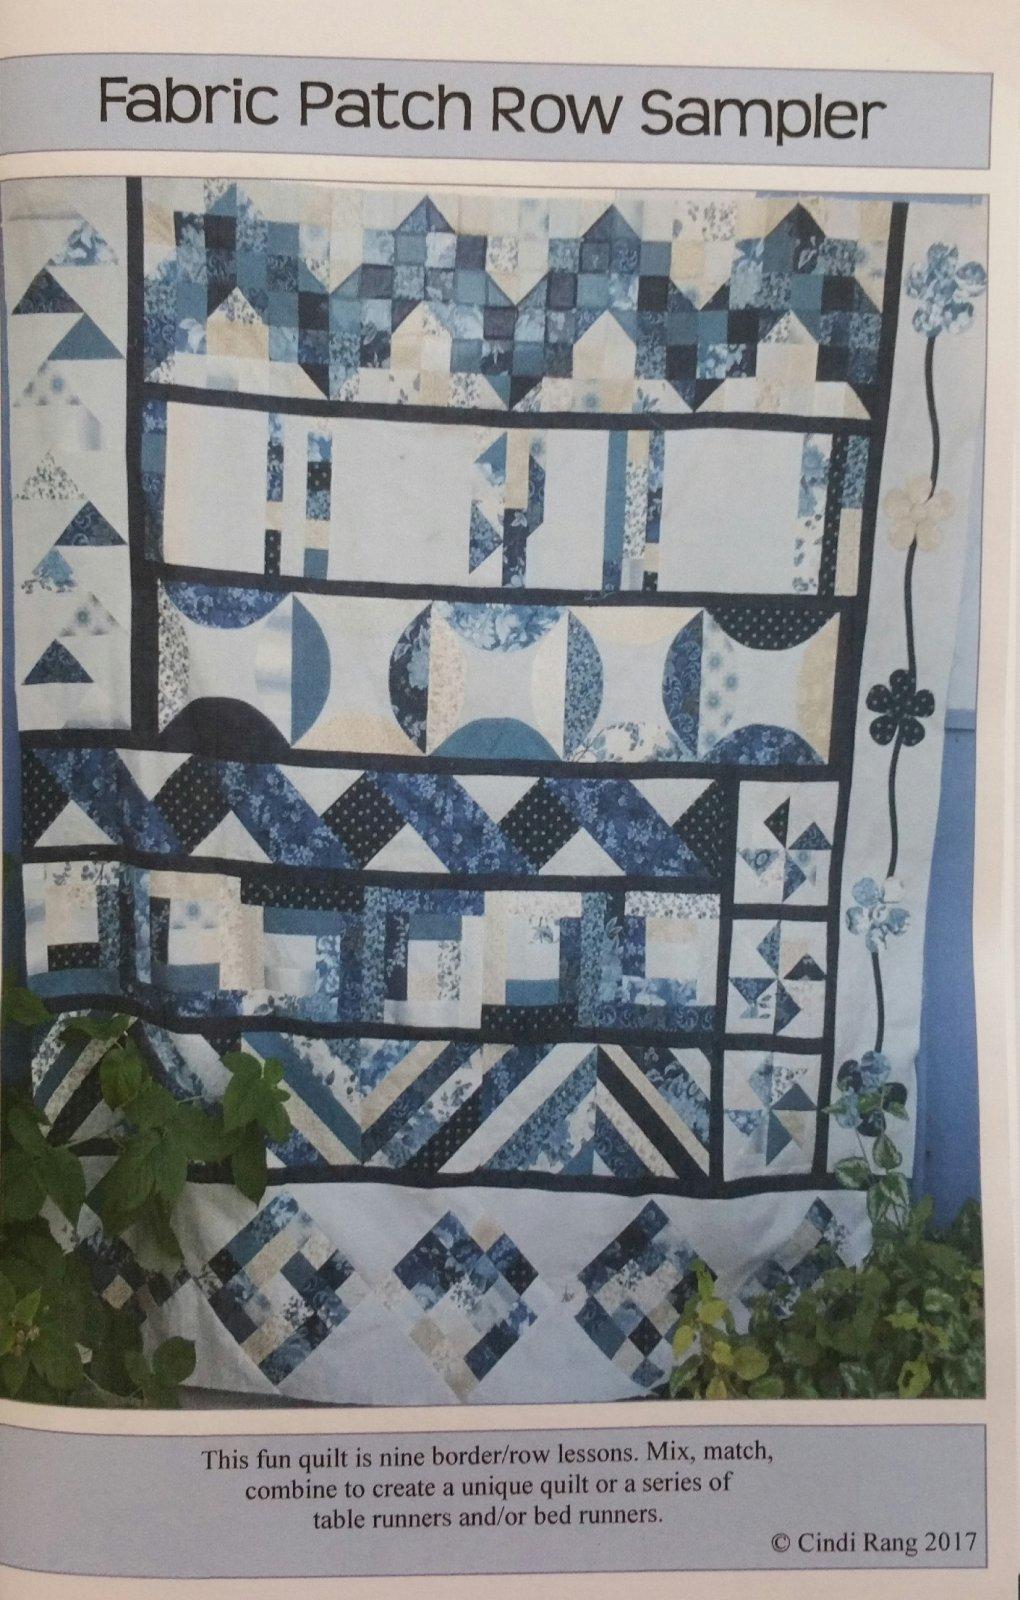 Fabric Patch Row Sampler